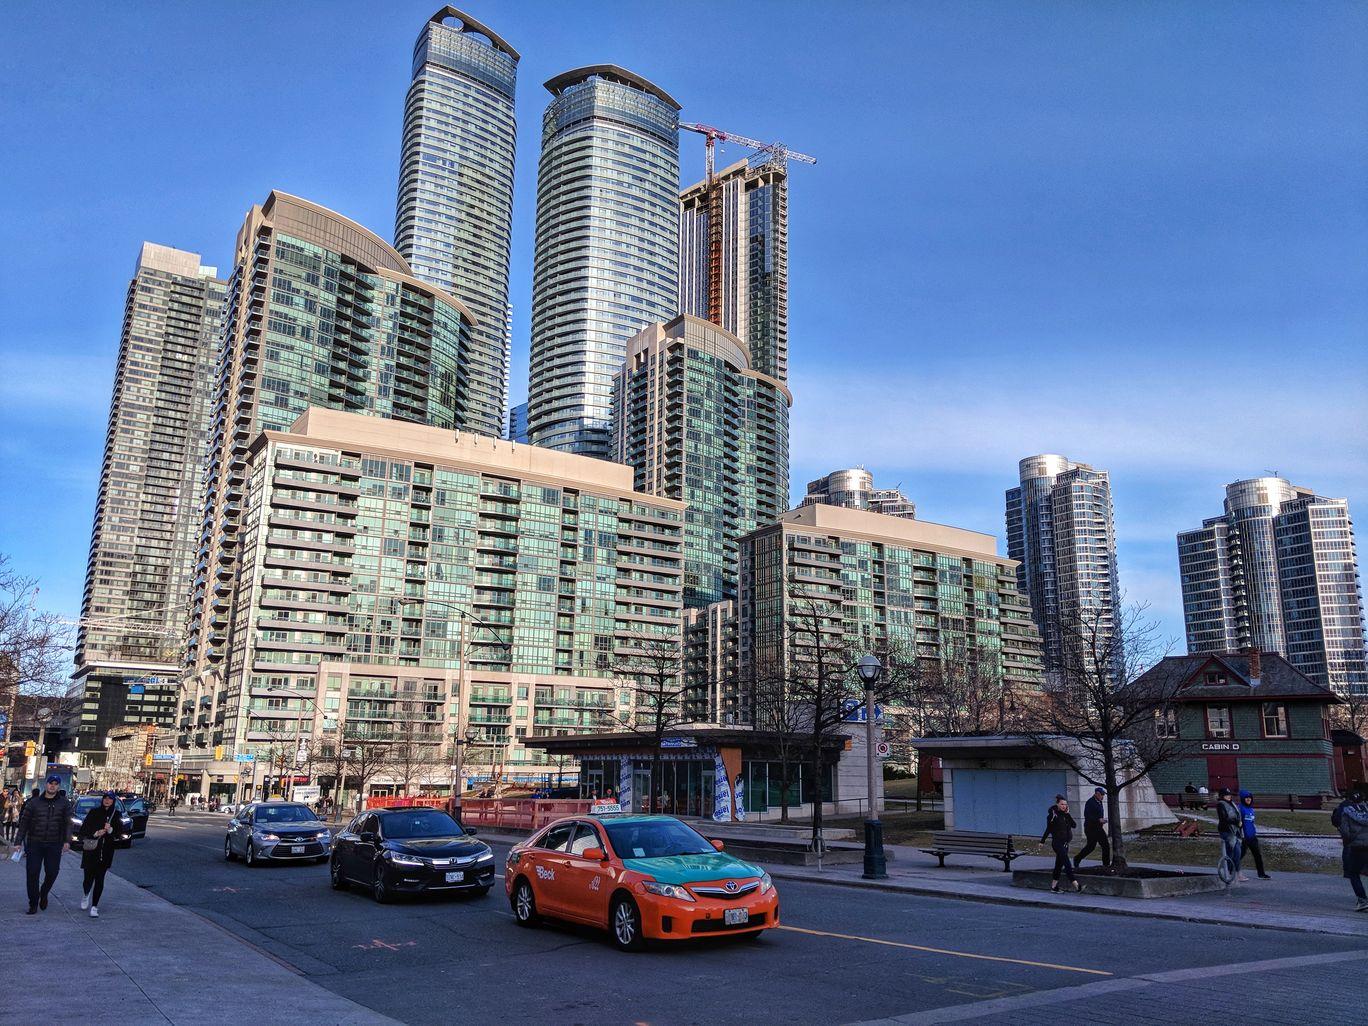 Photo of Toronto By Jay A. Patel